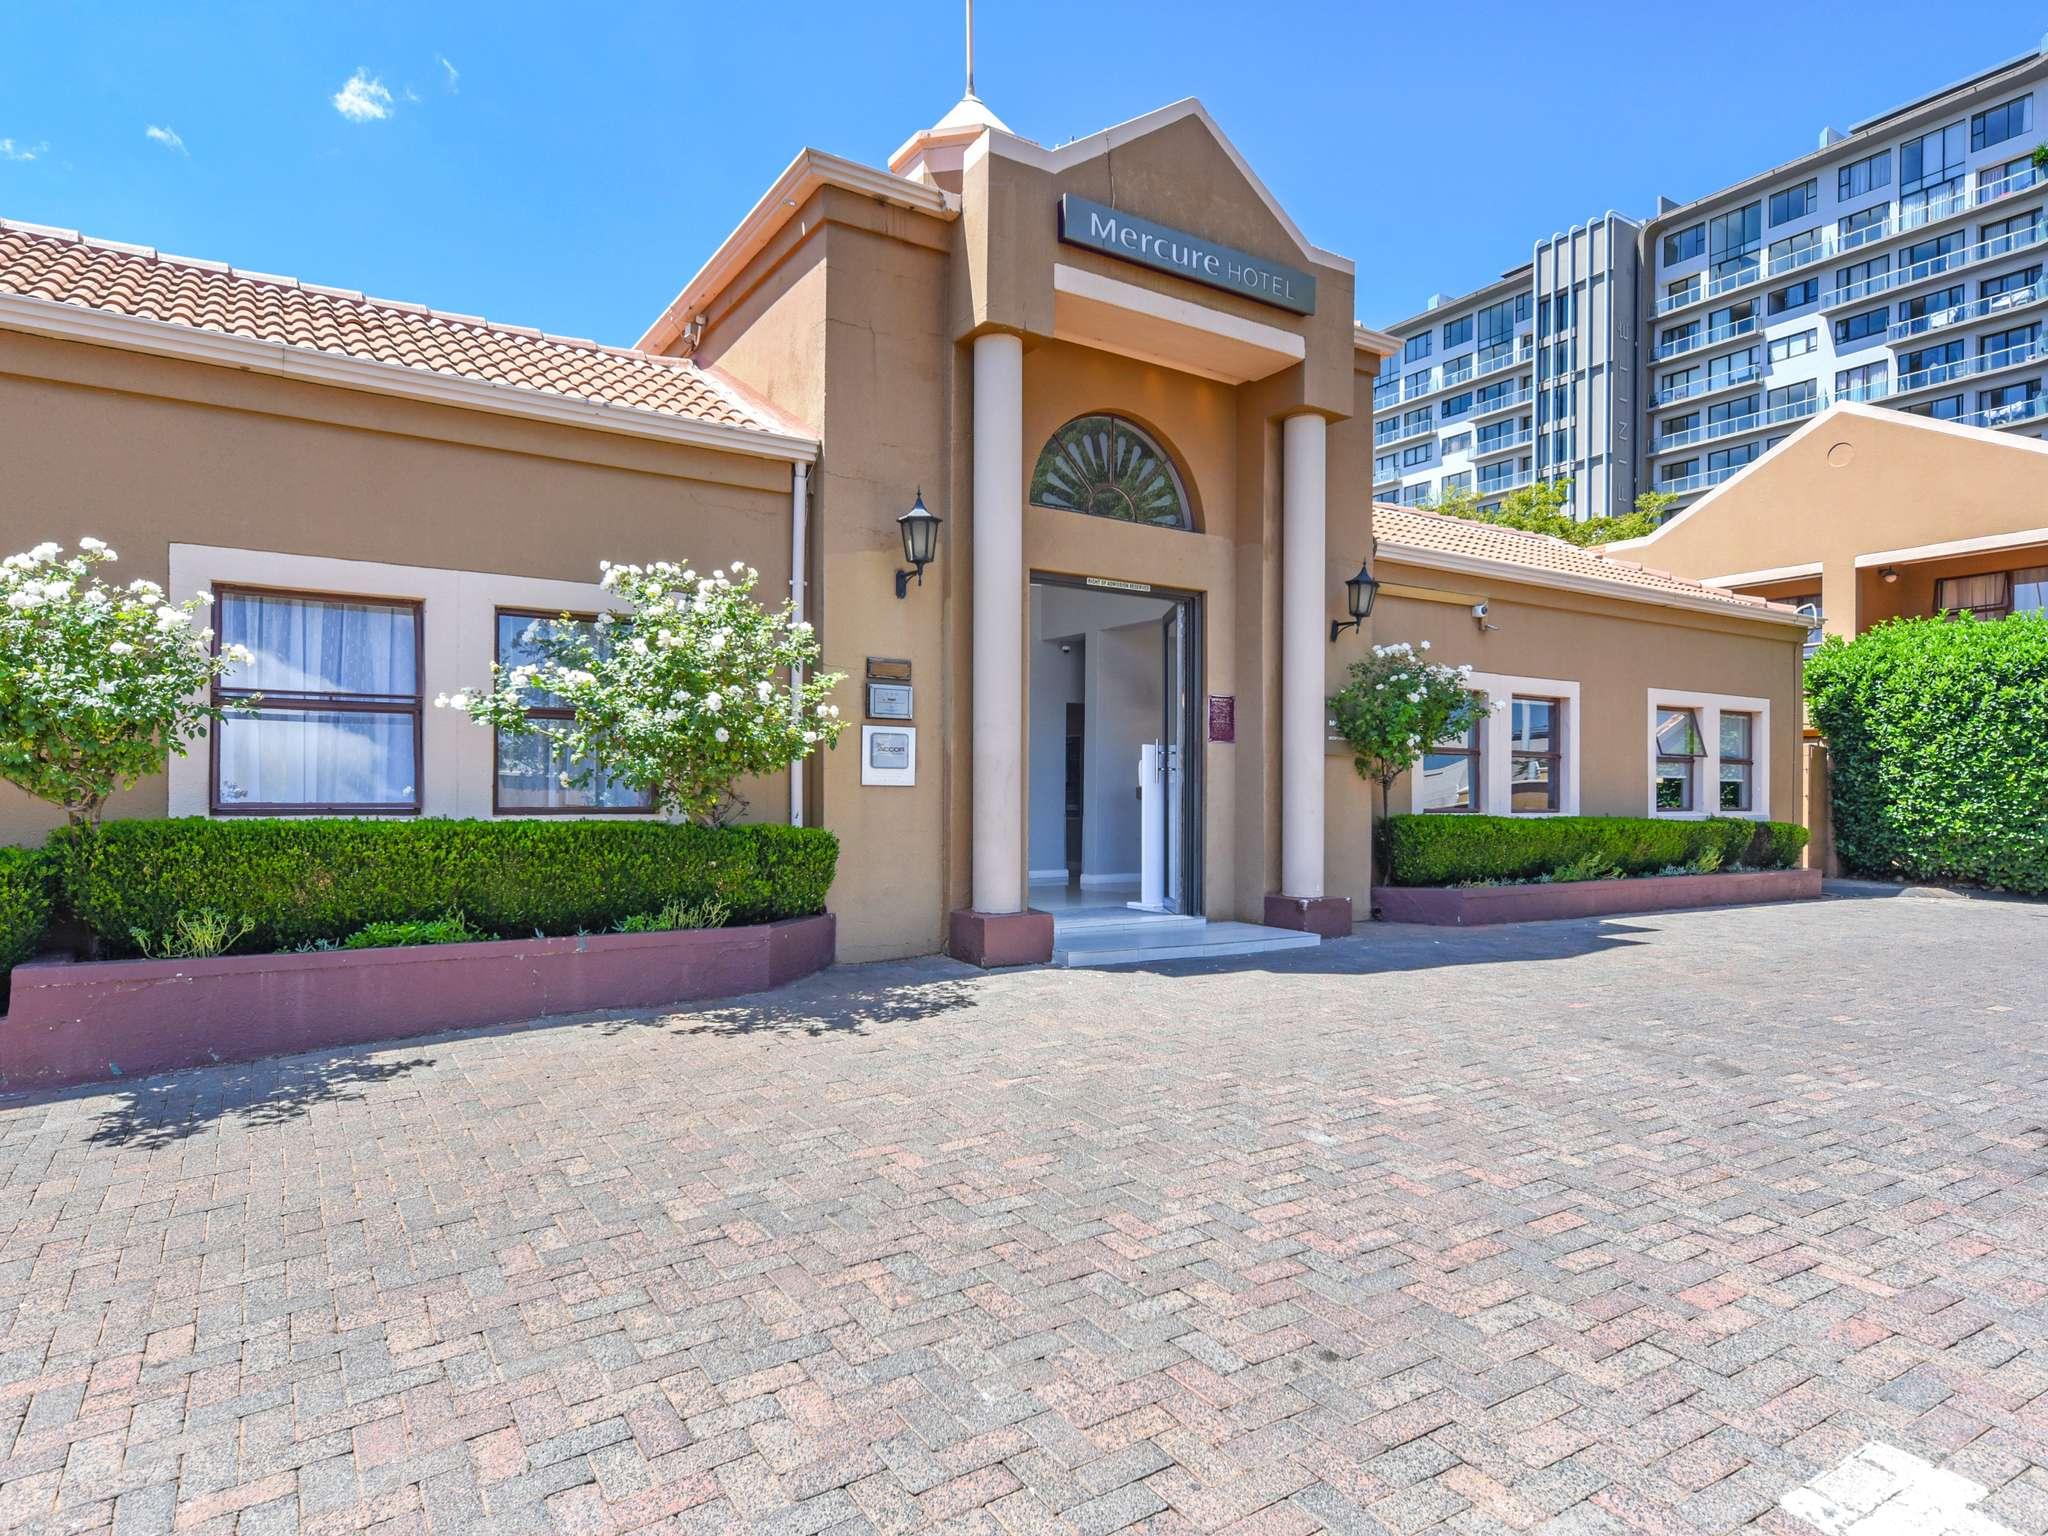 Hotel - Mercure Johannesburg Bedfordview Hotel